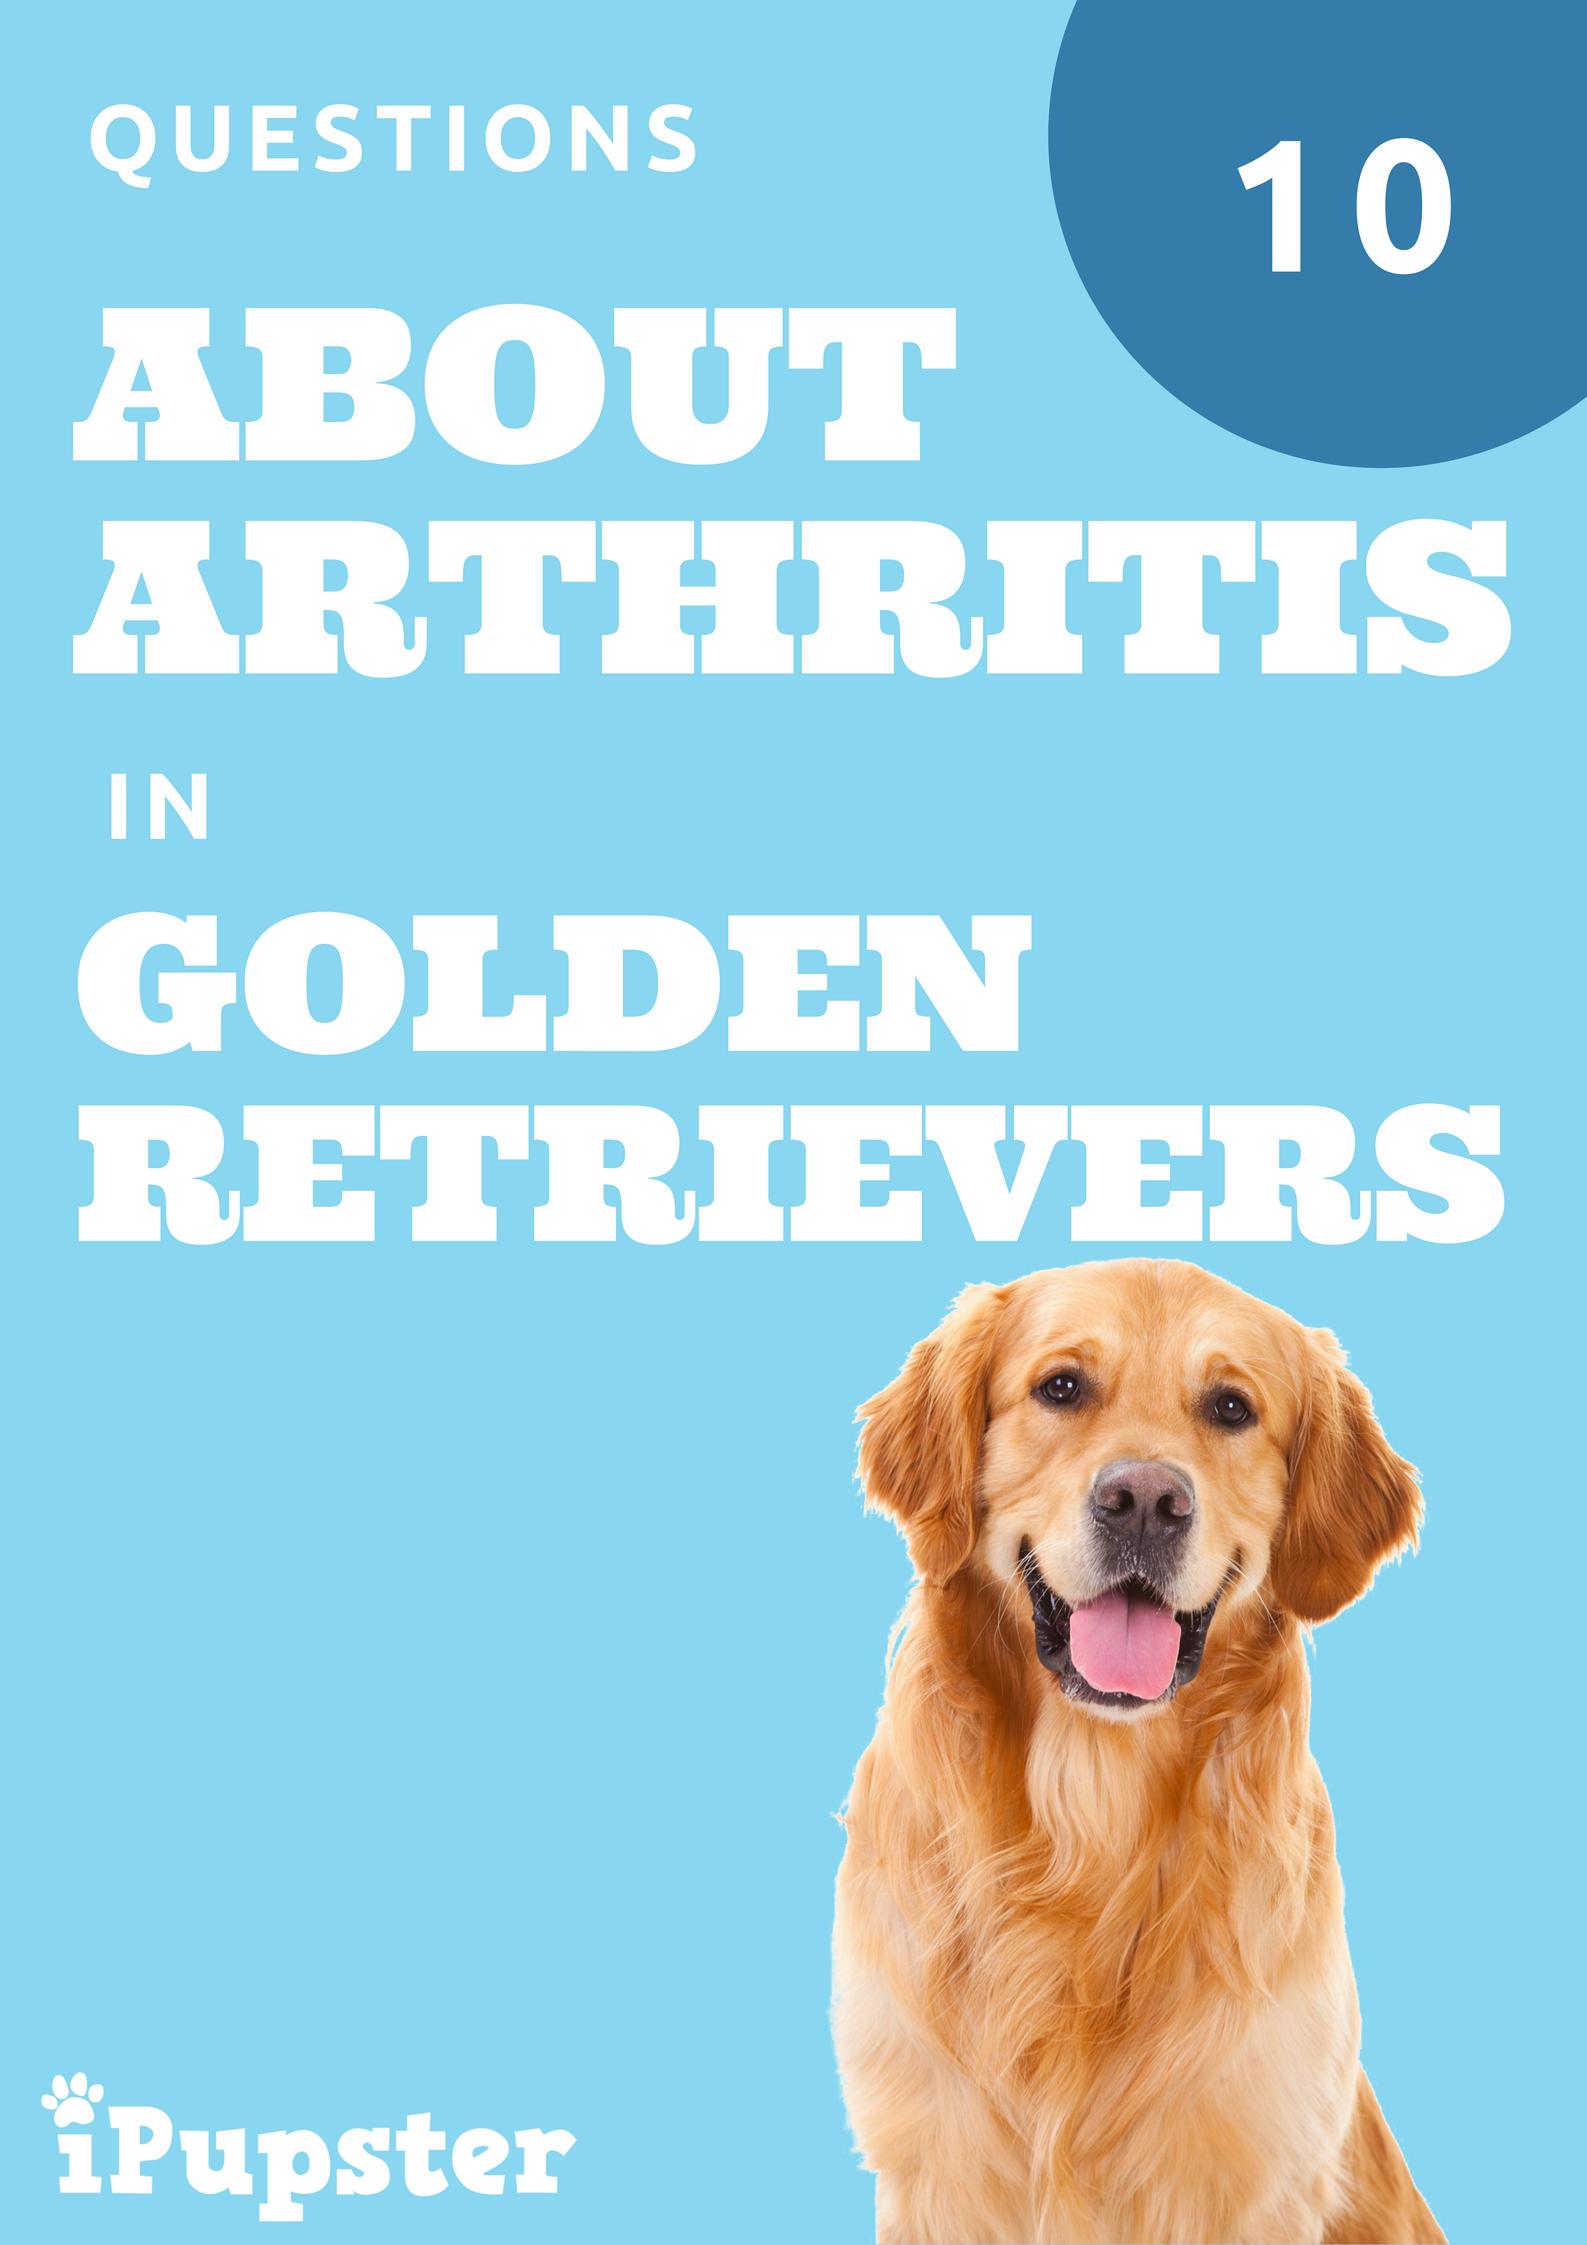 10 Questions about Arthritis in Older Golden Retriever